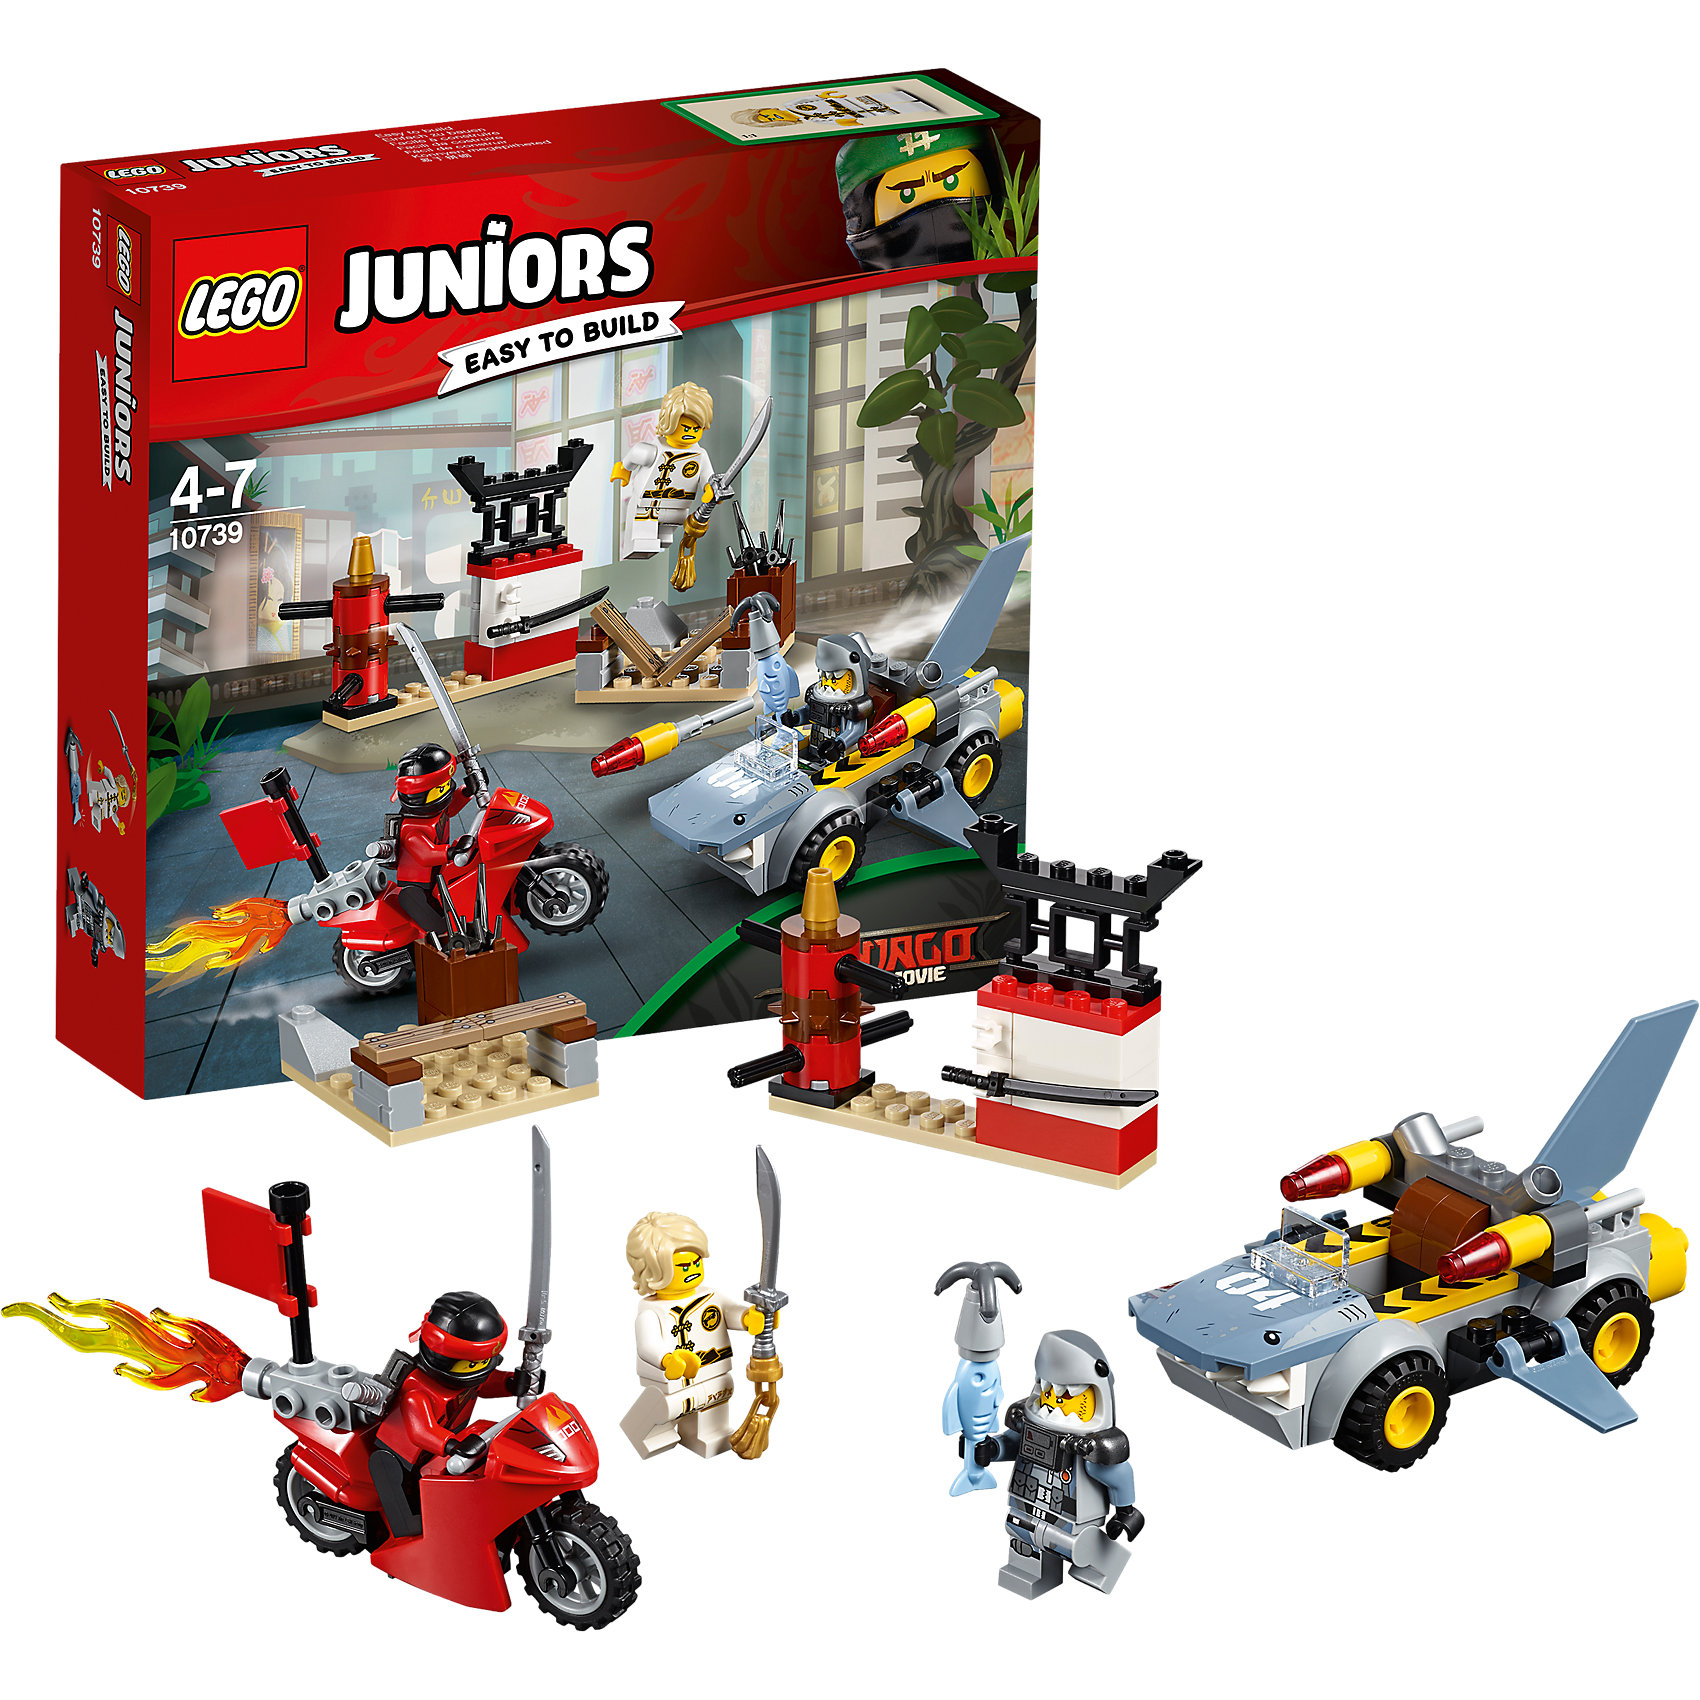 LEGO Juniors 10739: Нападение акулыПластмассовые конструкторы<br><br><br>Ширина мм: 207<br>Глубина мм: 190<br>Высота мм: 50<br>Вес г: 215<br>Возраст от месяцев: 48<br>Возраст до месяцев: 84<br>Пол: Мужской<br>Возраст: Детский<br>SKU: 5620065